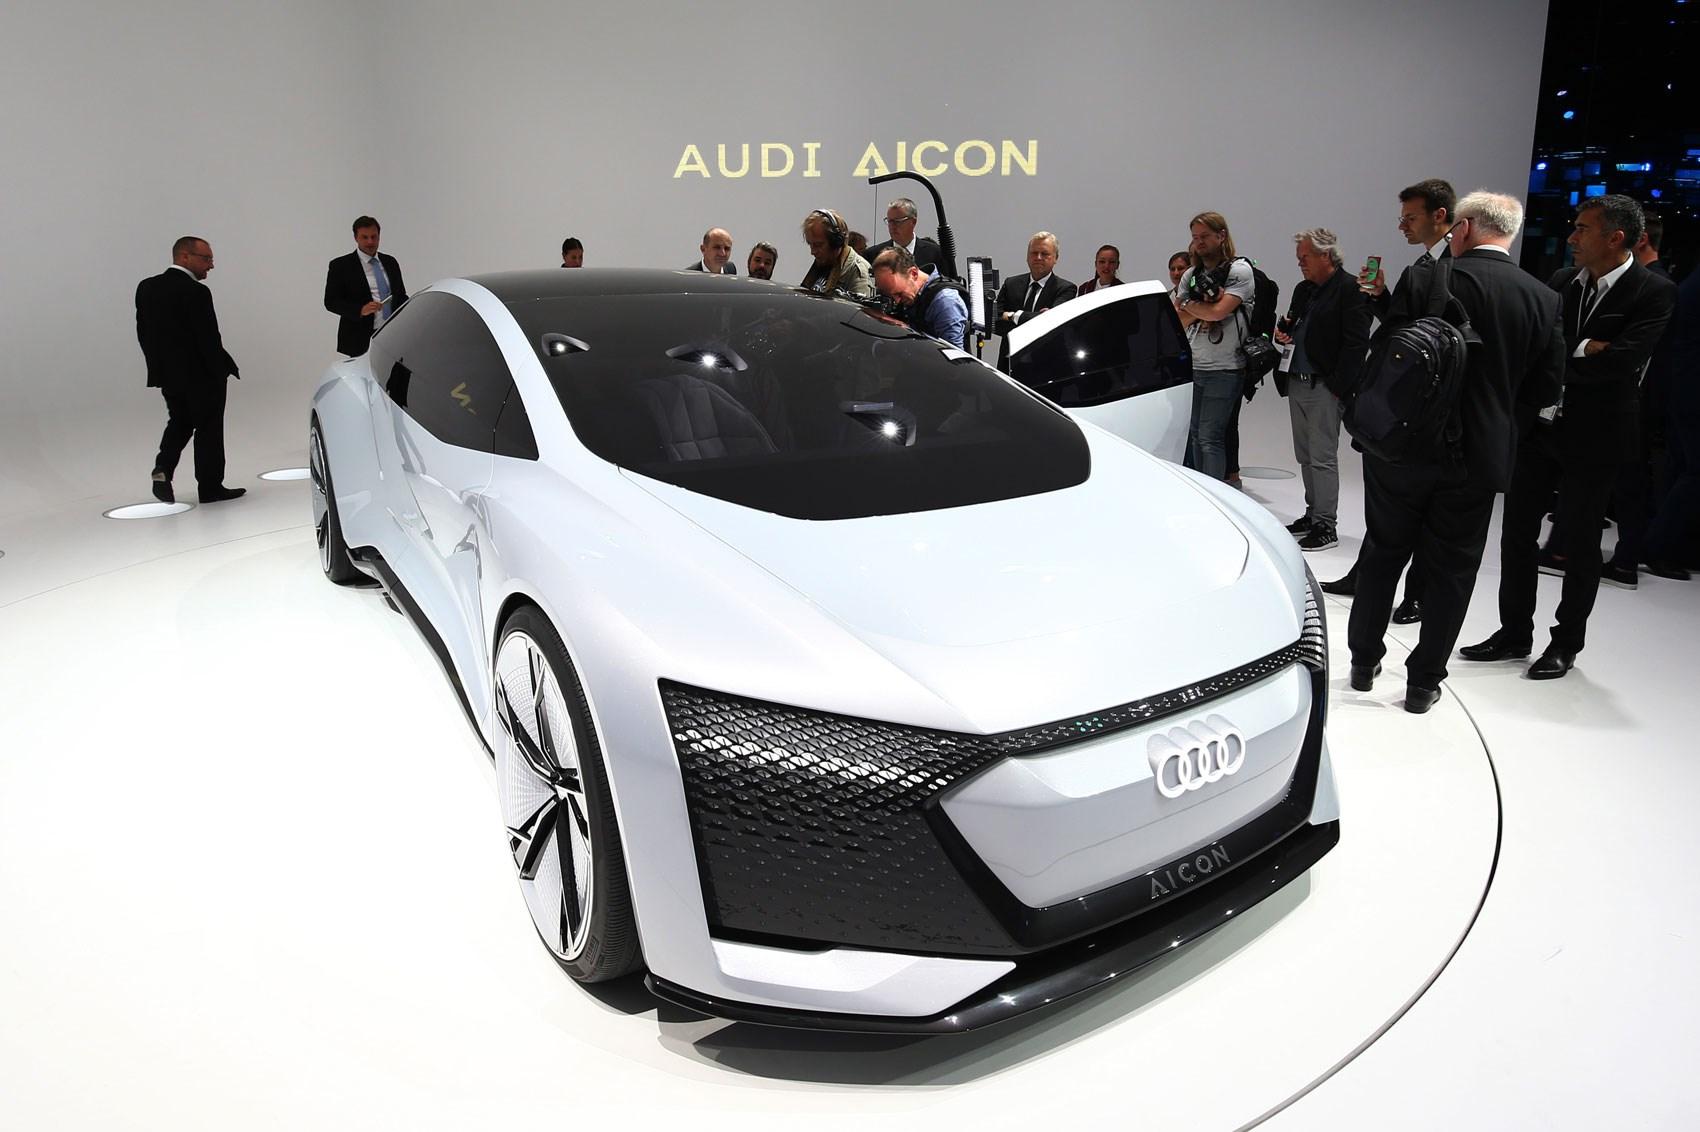 Audi Aicon And Elaine Concepts At Frankfurt Motor Show CAR - Audis